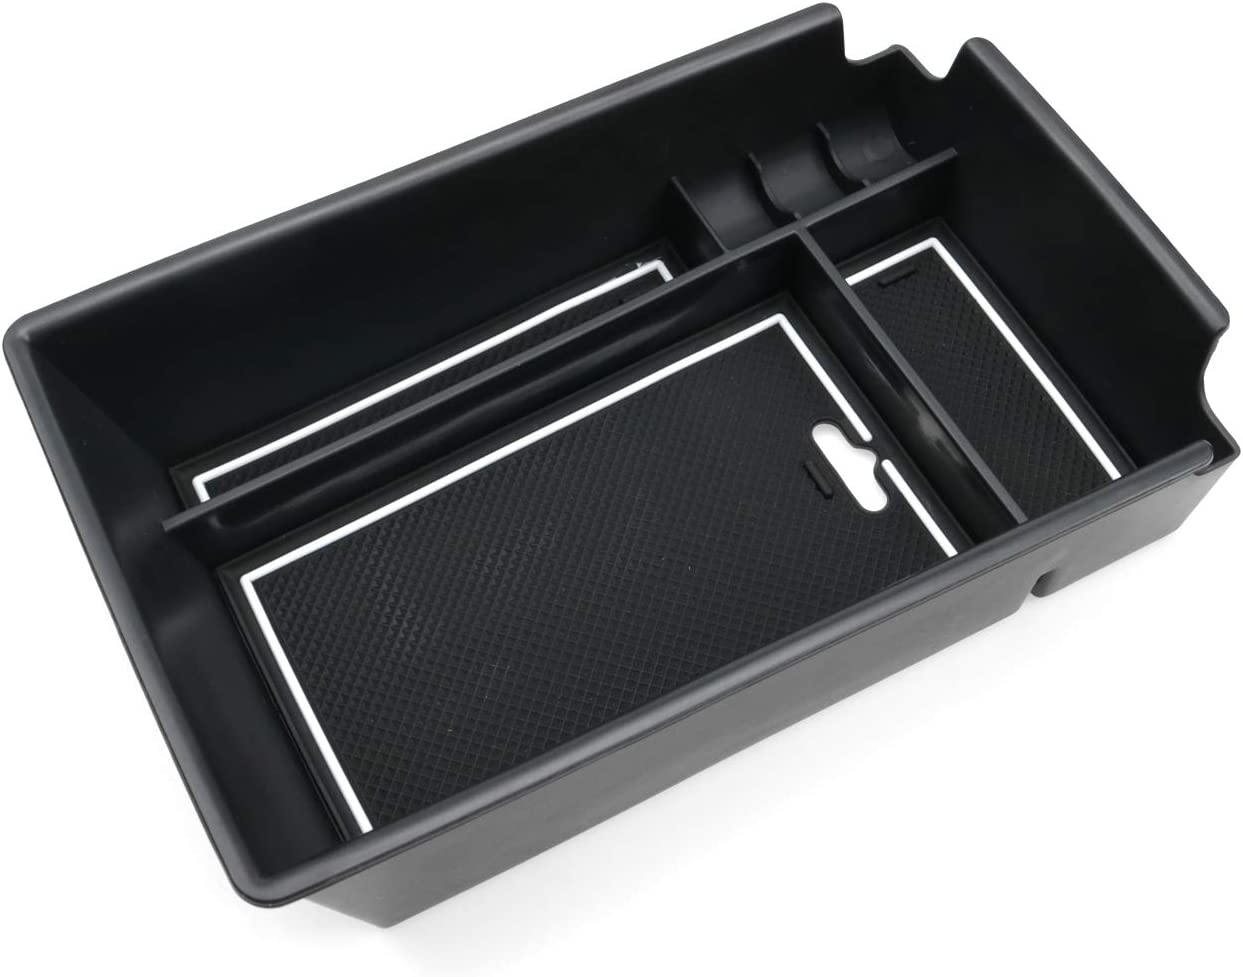 Black Sonata DN8 Accessories,Insert ABS Black Materials Tray Secondary Storage Box RUIYA Center Console Organizer Tray Compatible with 2020